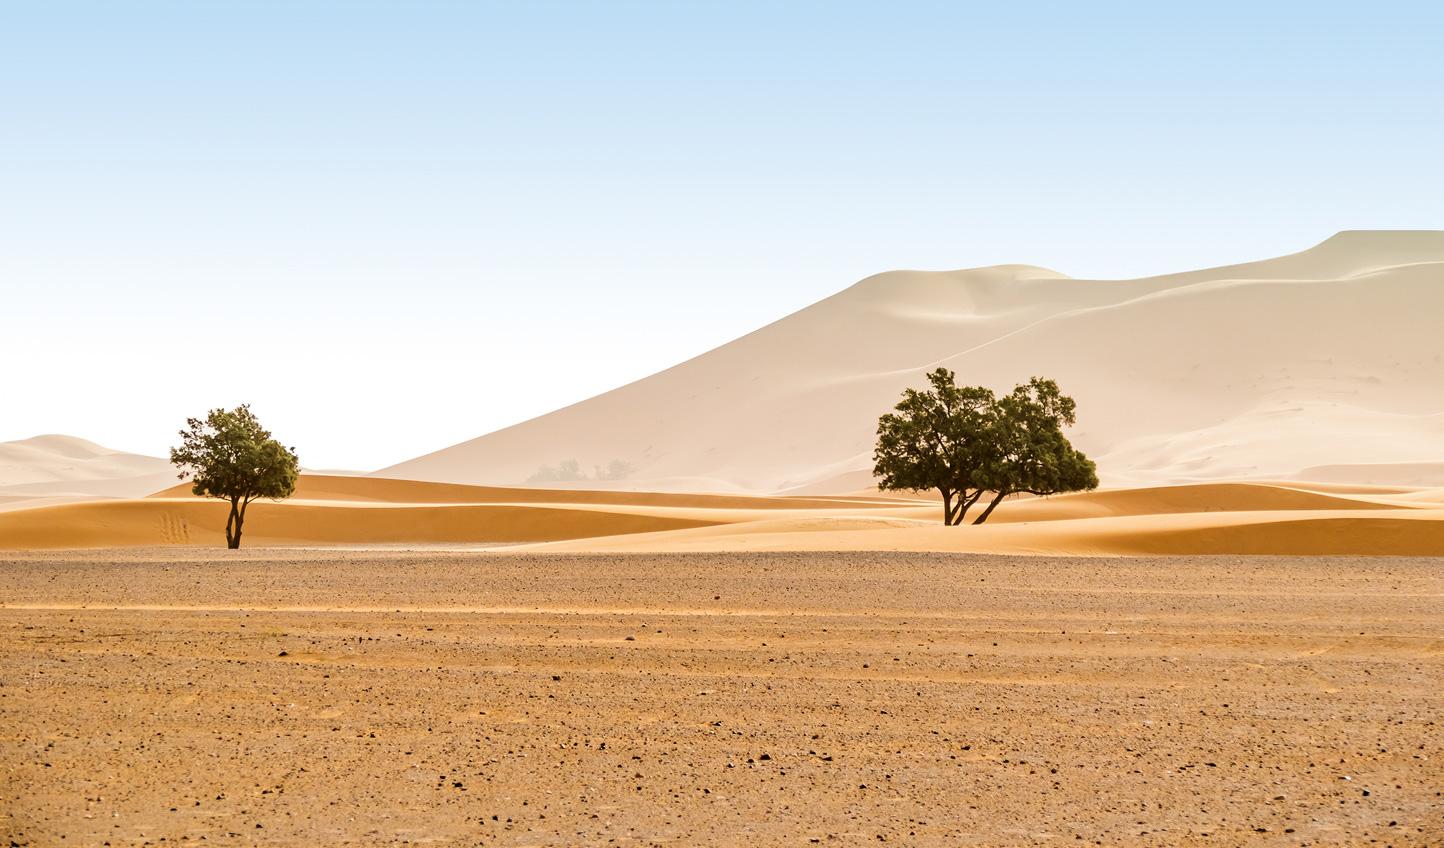 Head deep into the desert